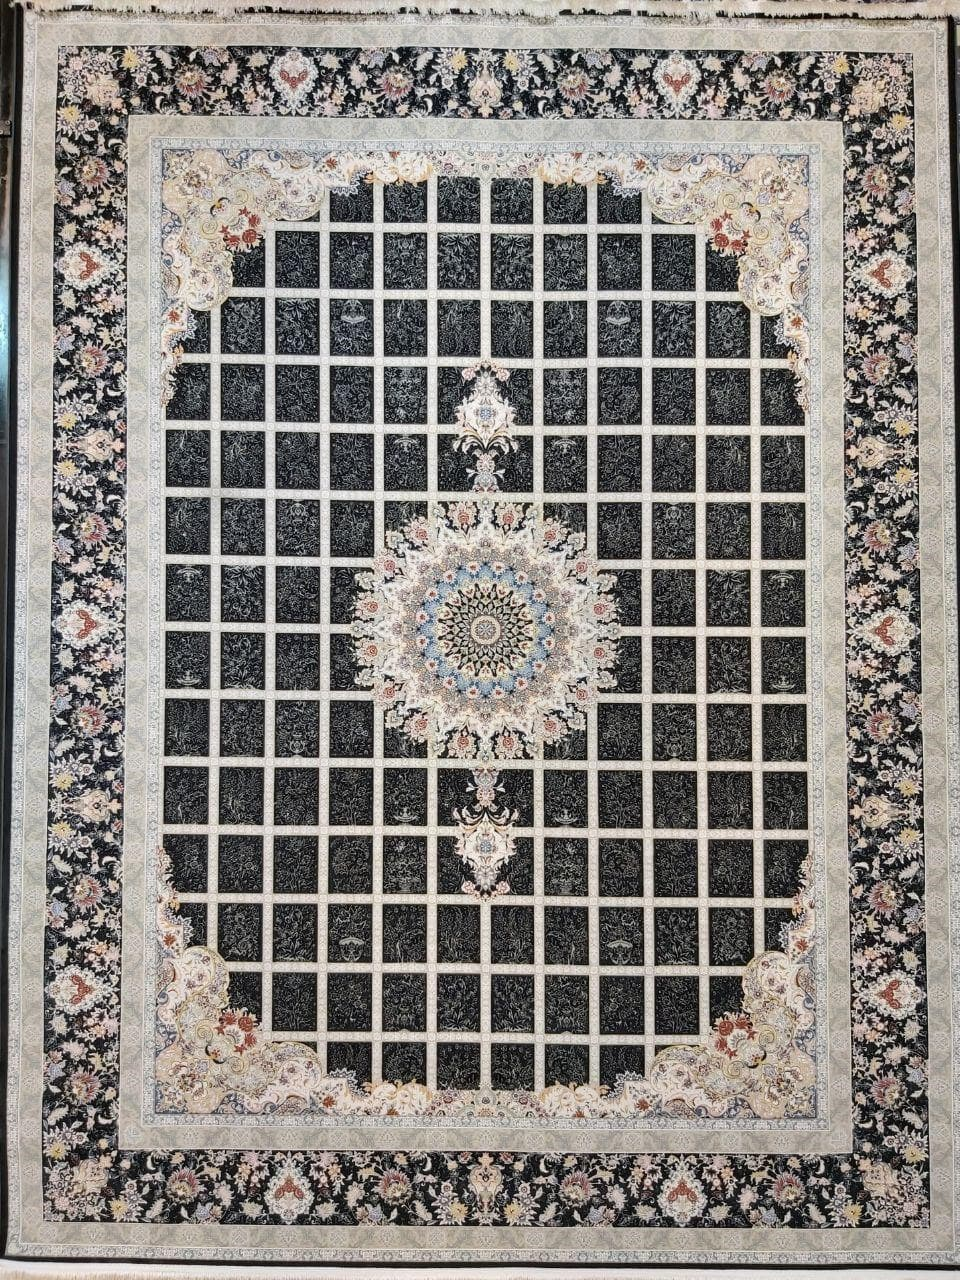 فرش 1500 شانه گل برجسته نقشه مانلی زمینه ذغالی